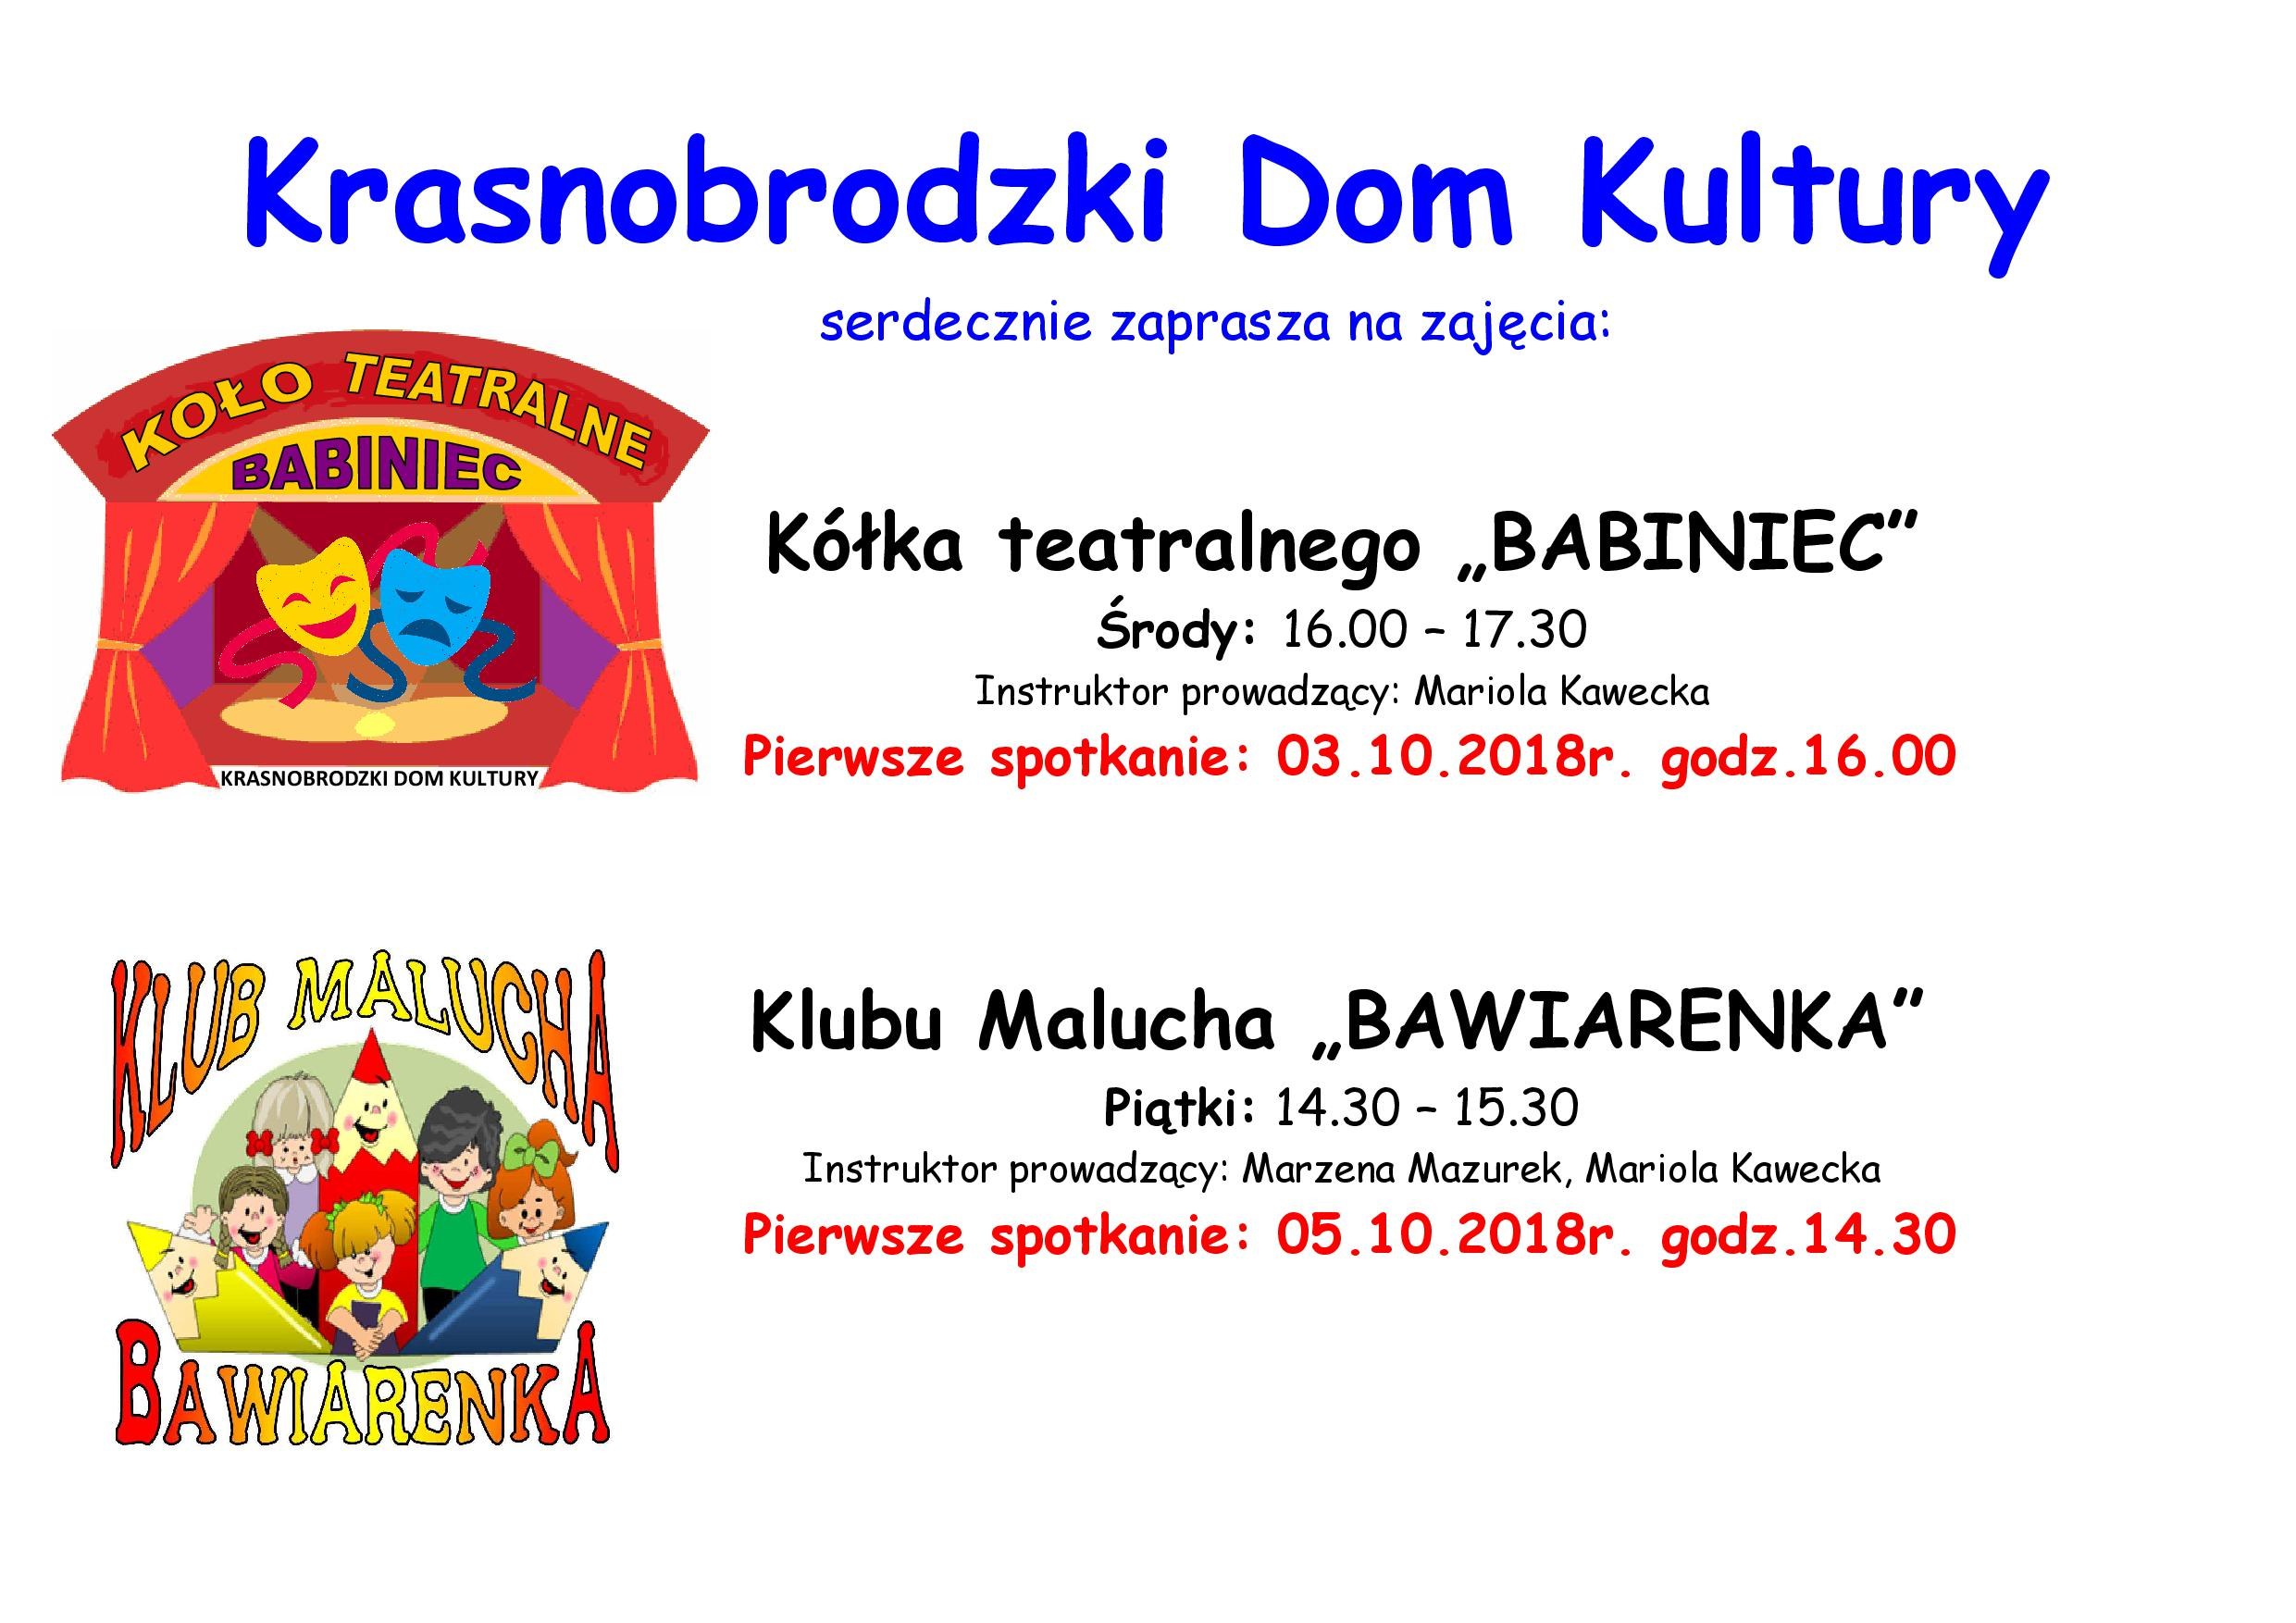 zajęcia KDK teatralne bawiarenka